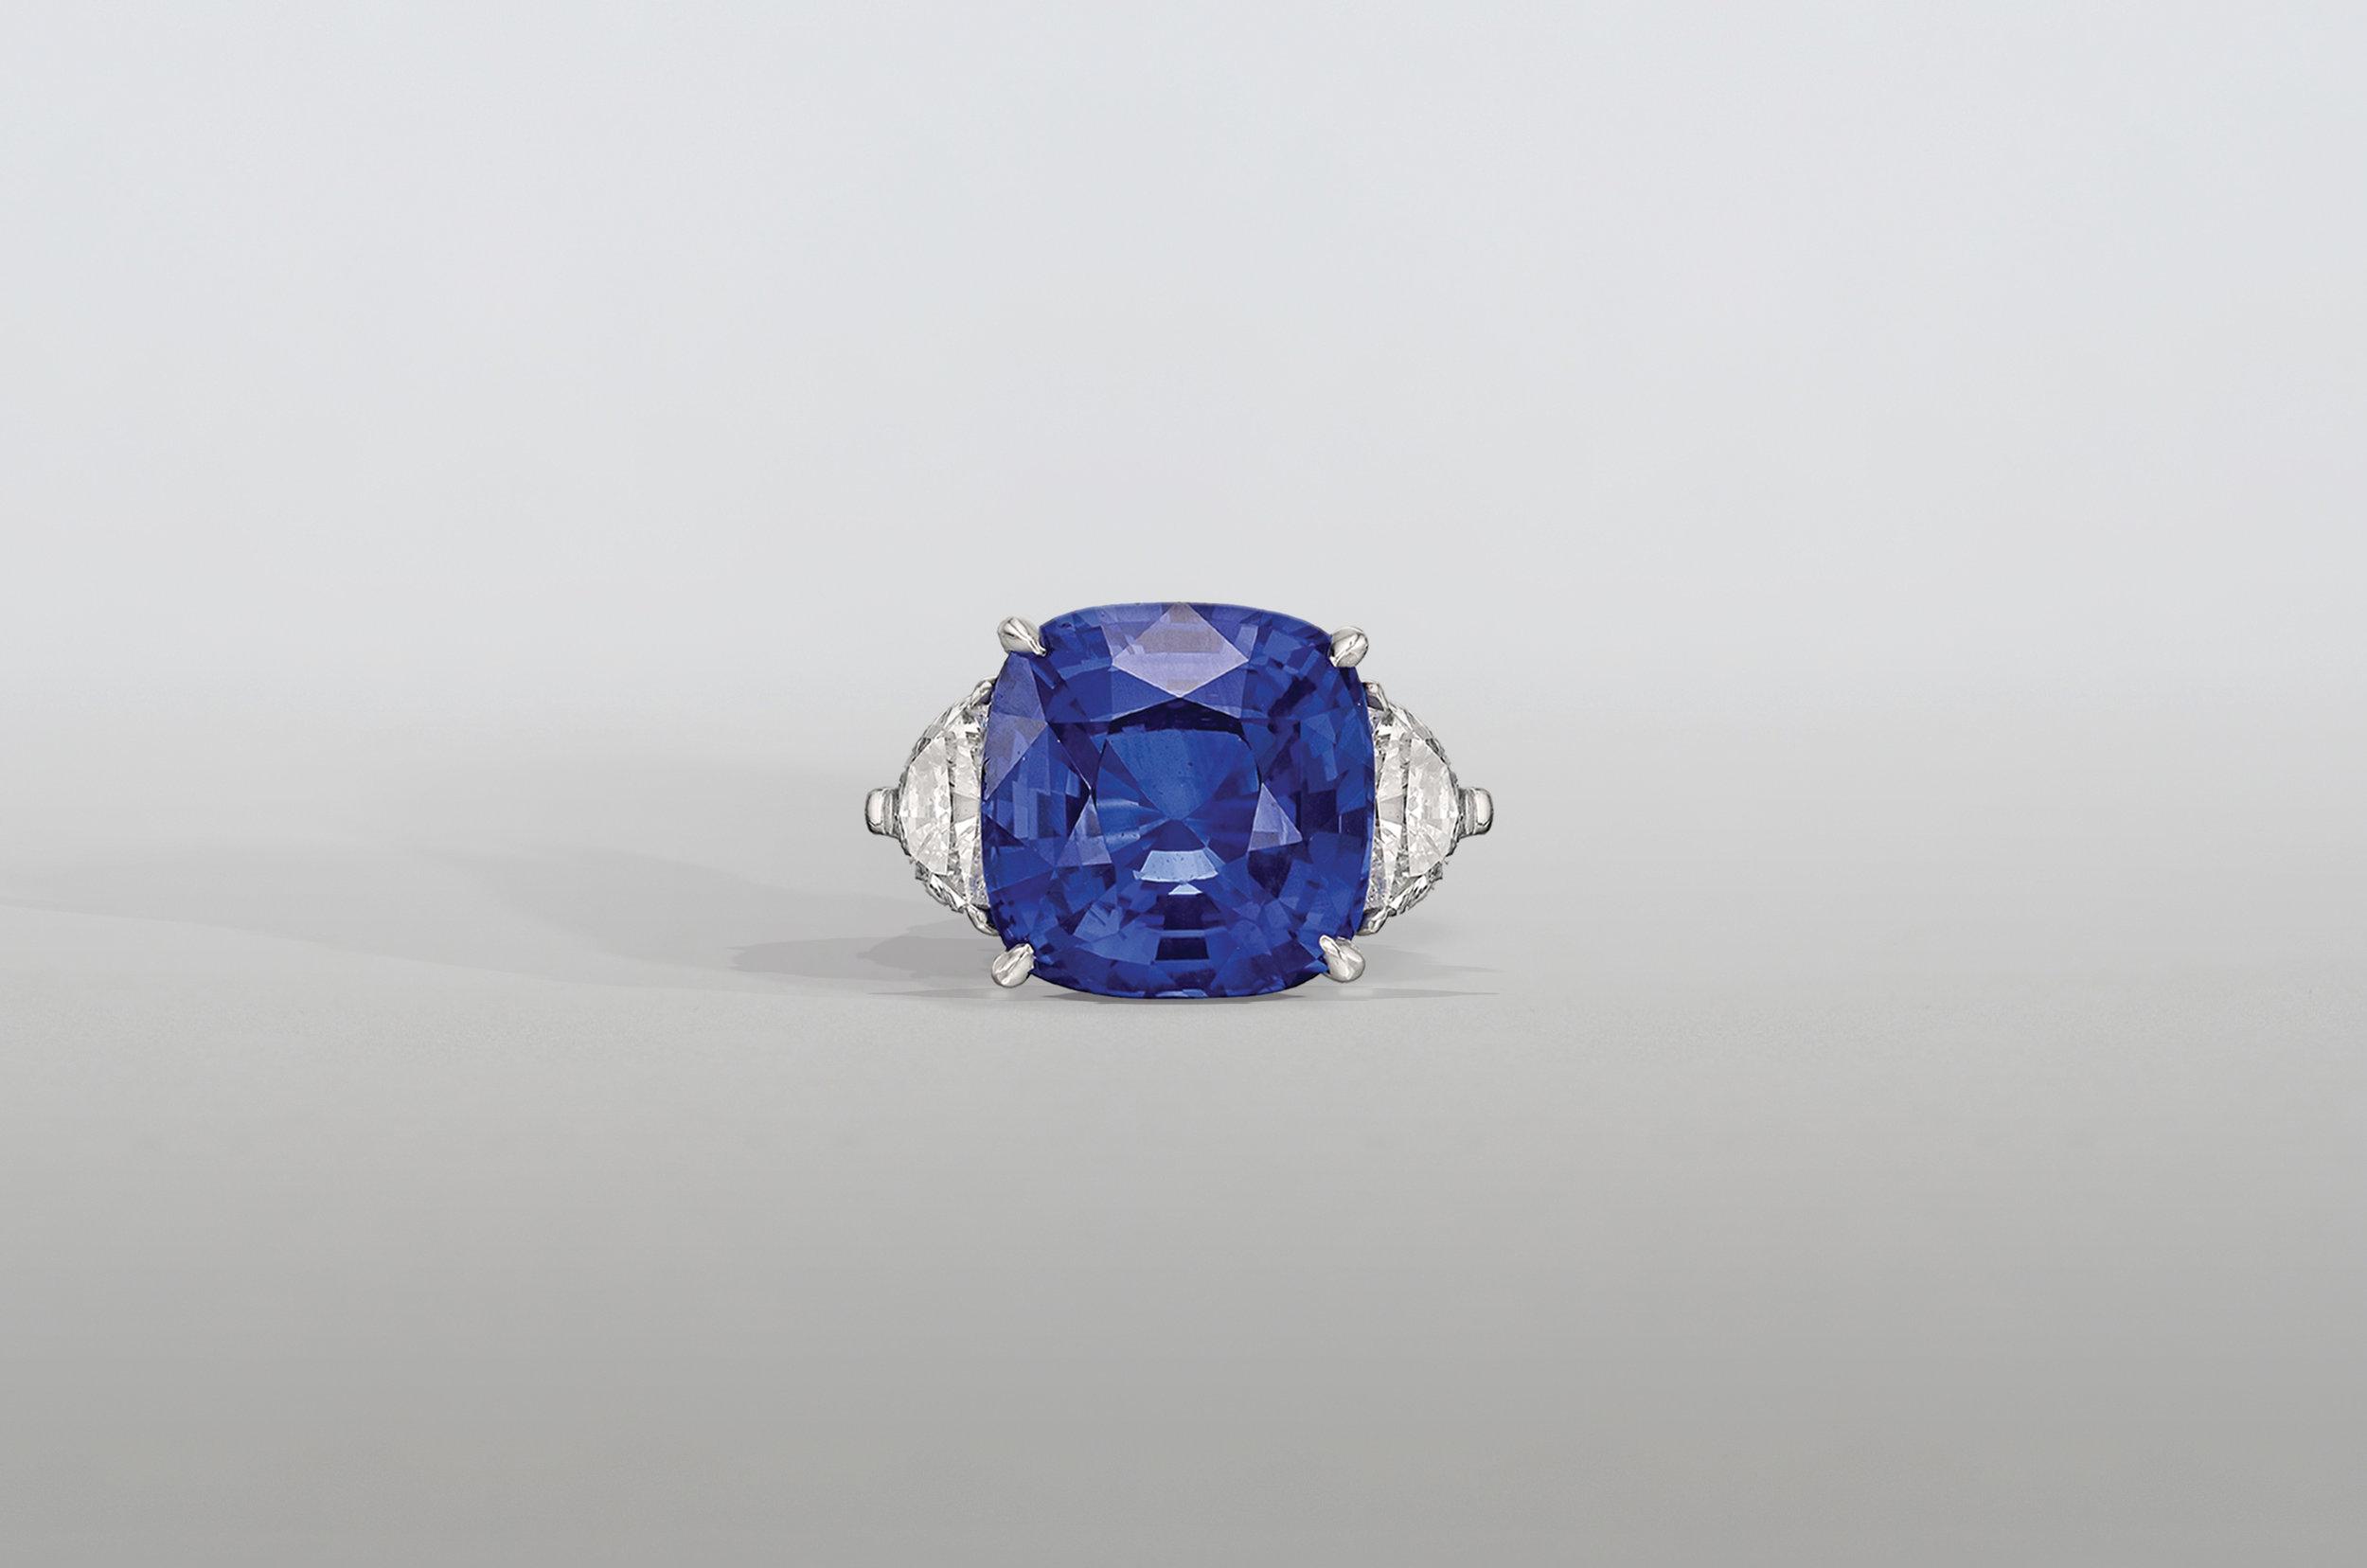 8.5 Carat Cushion Sapphire Ring with Trillion Diamonds set in Platinum